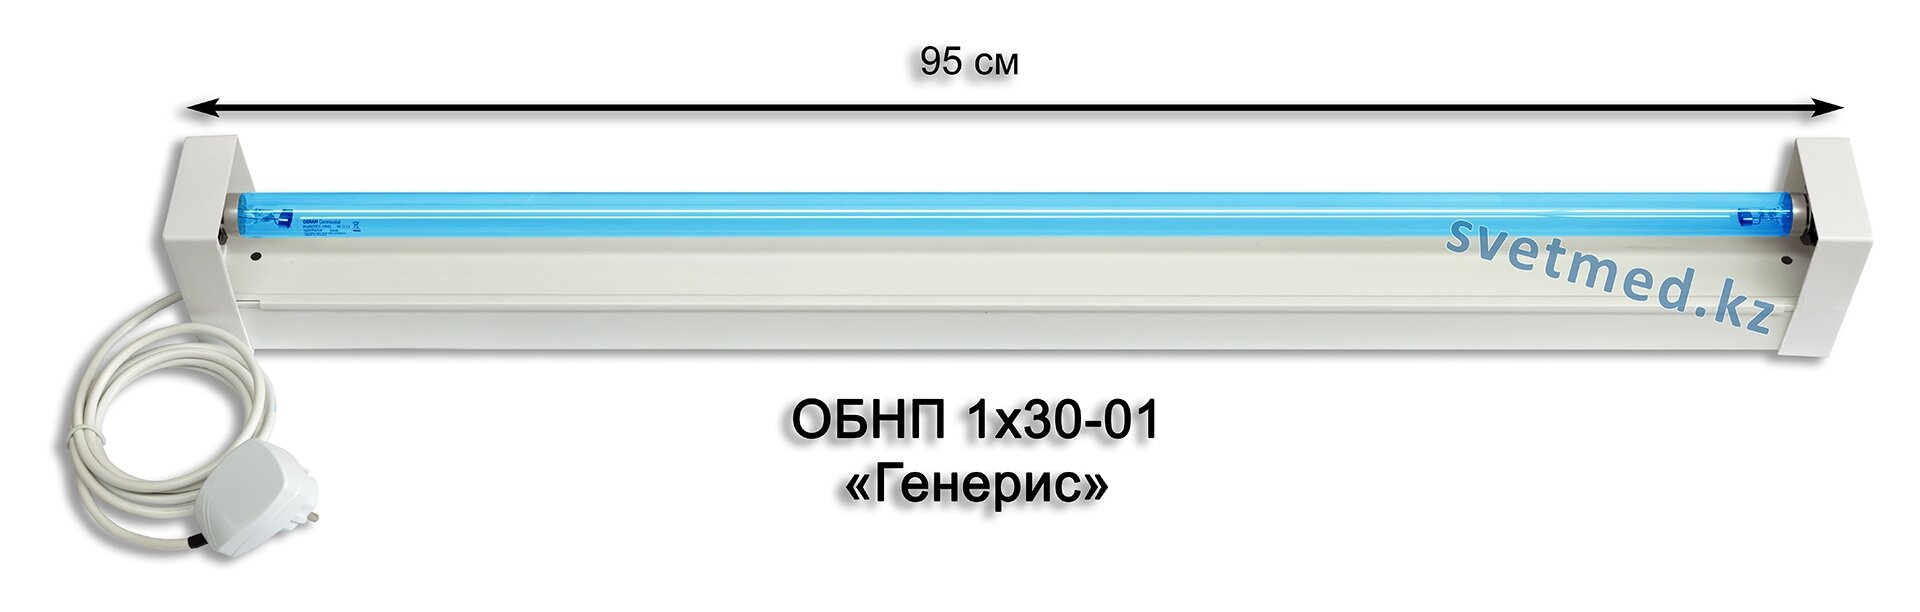 ОБНП 1х30-01 Генерис